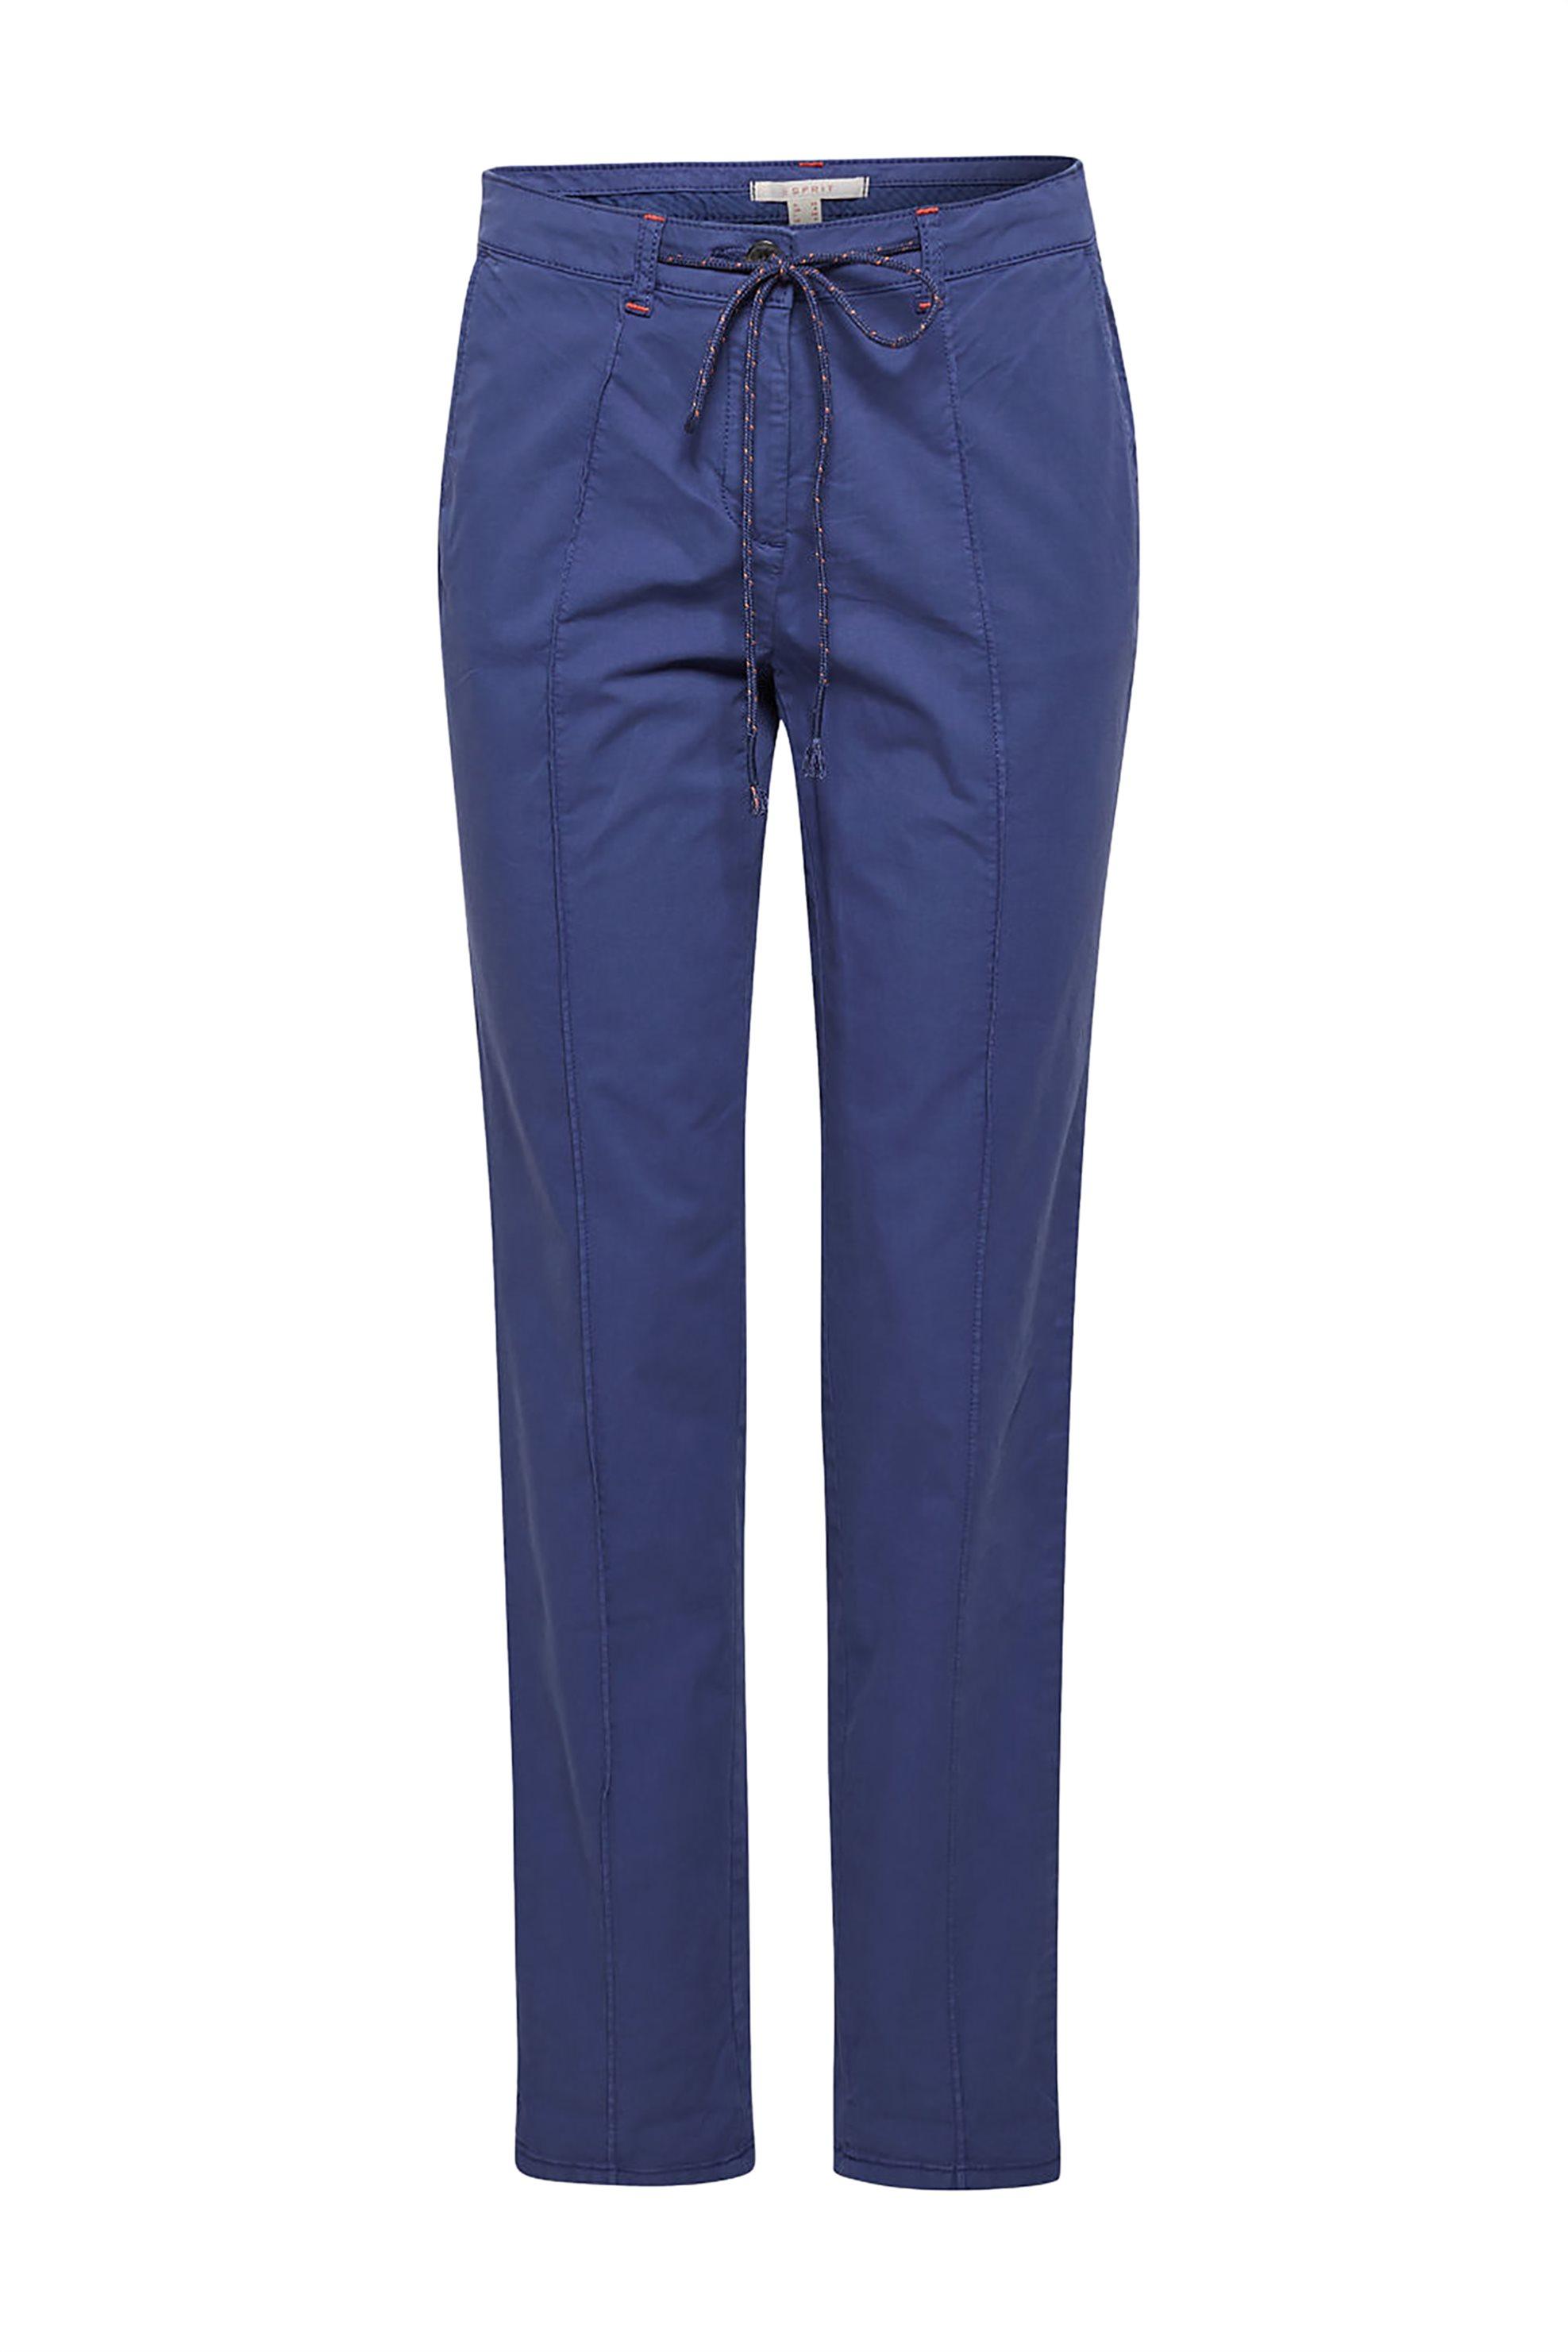 Esprit γυναικείο παντελόνι chinos με κορδόνι στην μέση - 029EE1B032 - Μπλε γυναικα   ρουχα   παντελόνια   chinos